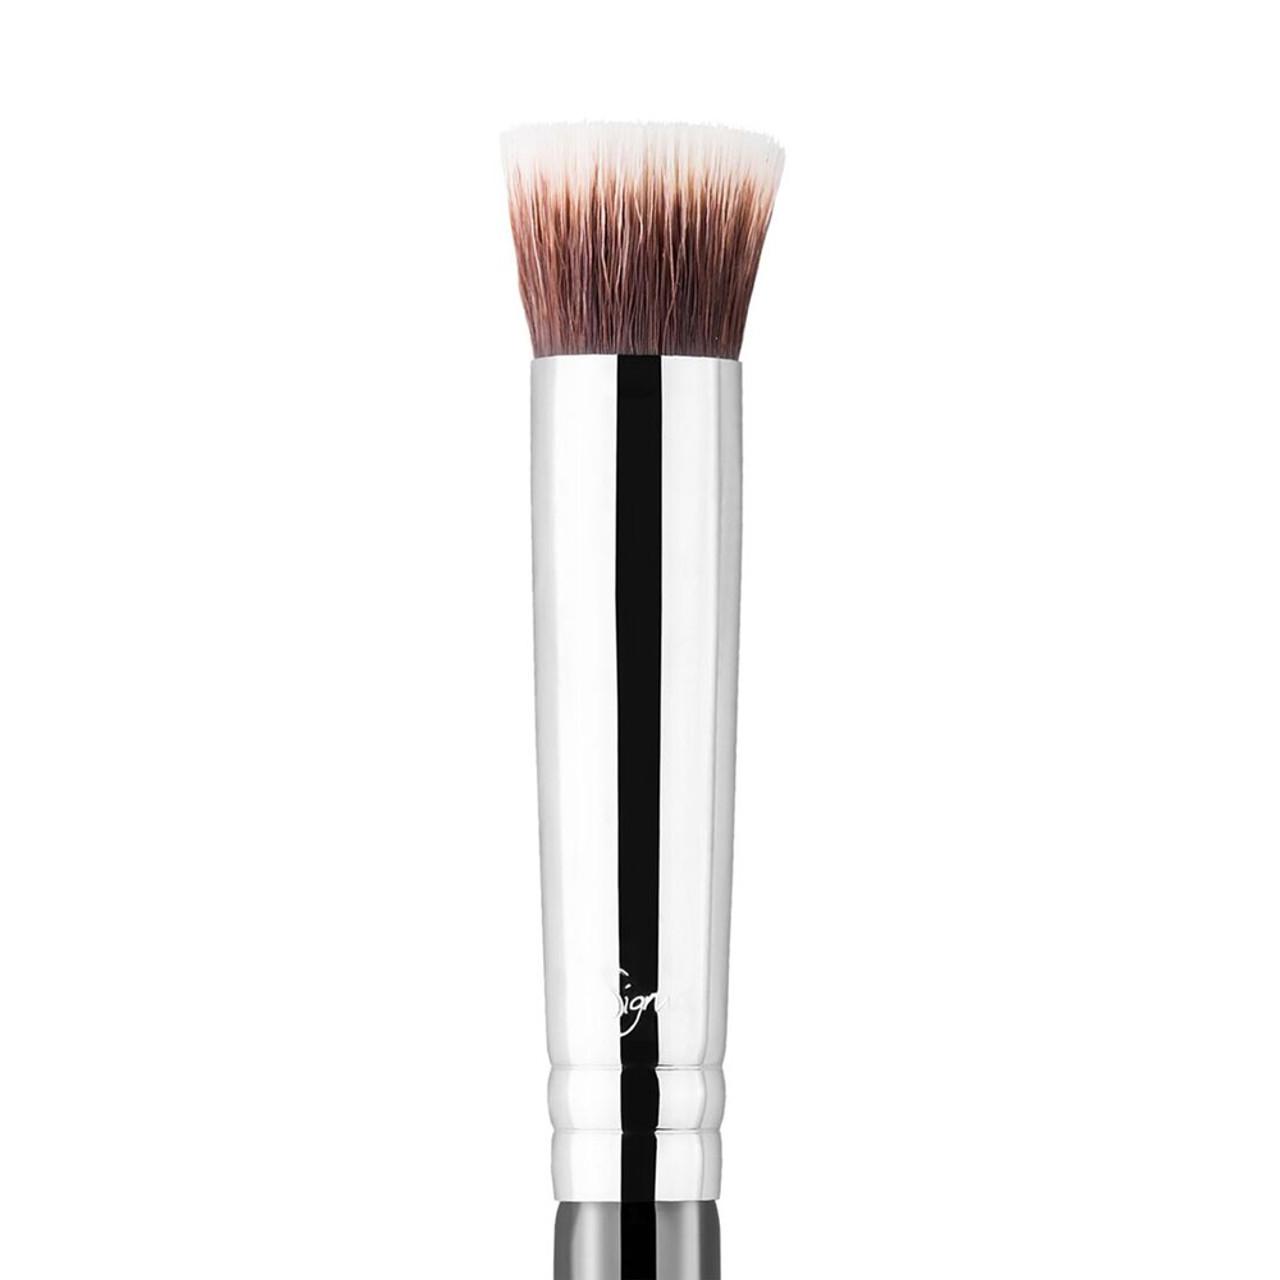 Sigma Beauty P80 - Precision Flat Brush™ BeautifiedYou.com